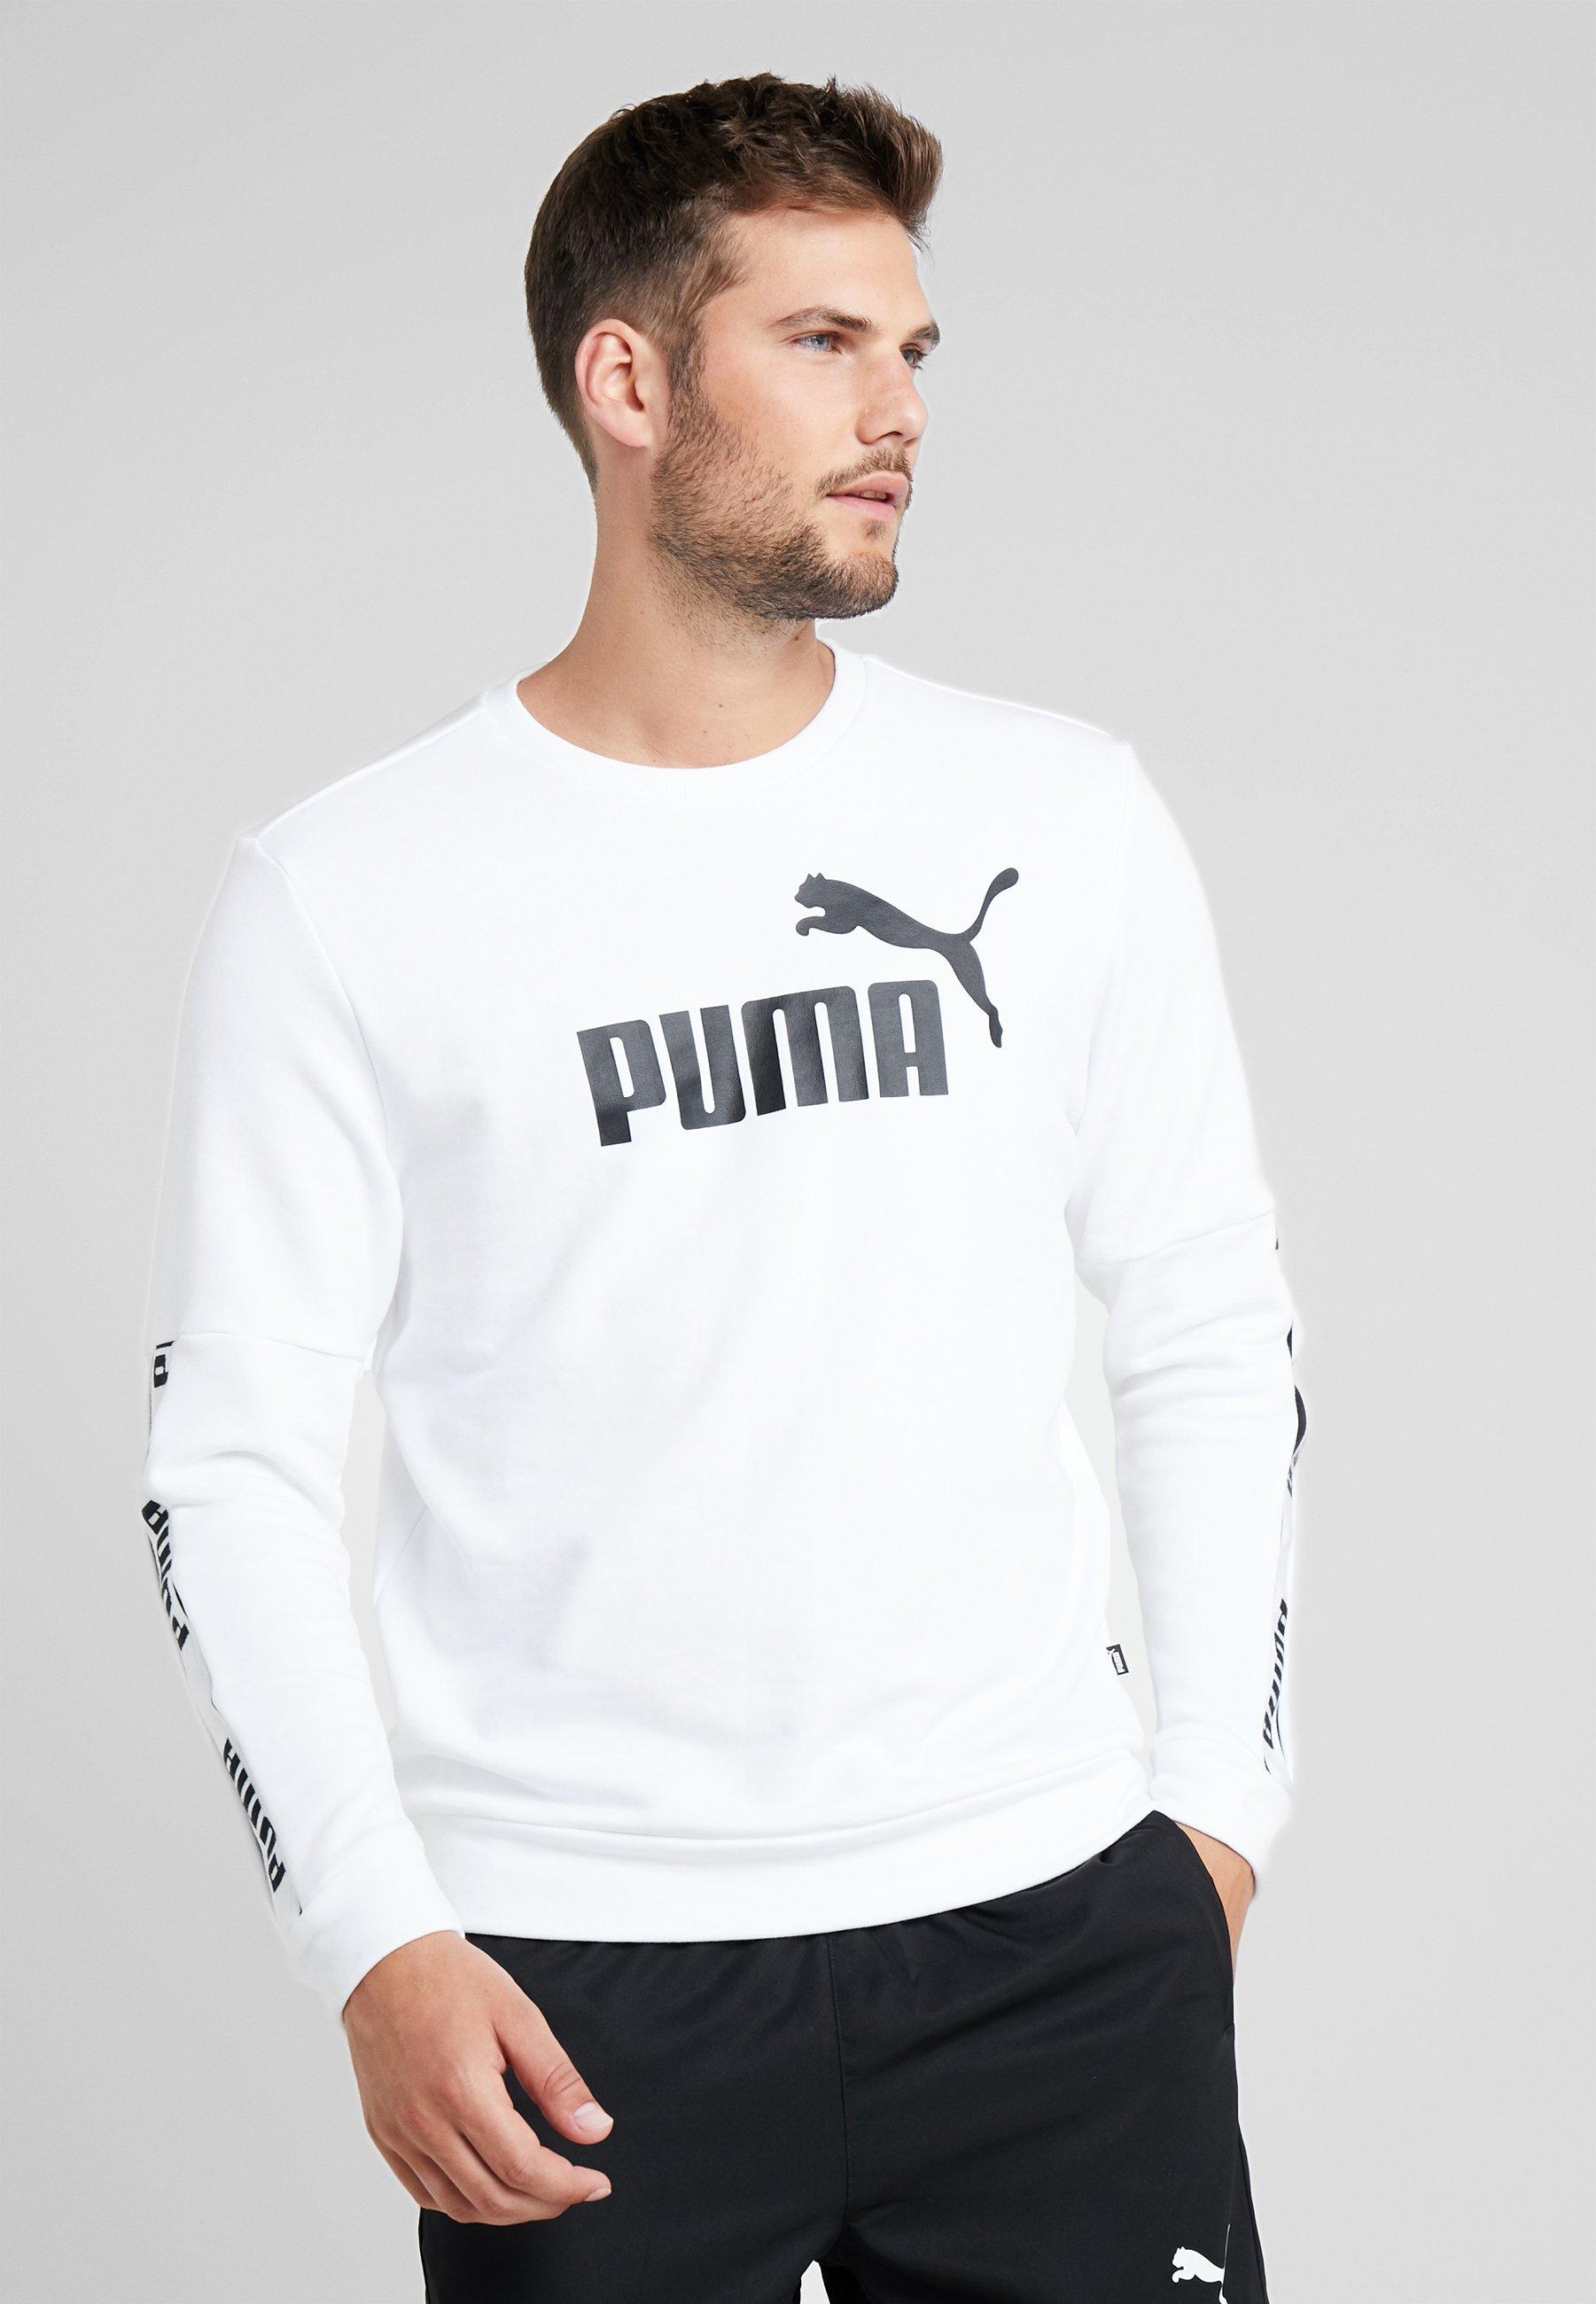 CrewSweatshirt White White Puma Amplified Amplified Puma Puma CrewSweatshirt 3qRAj45L